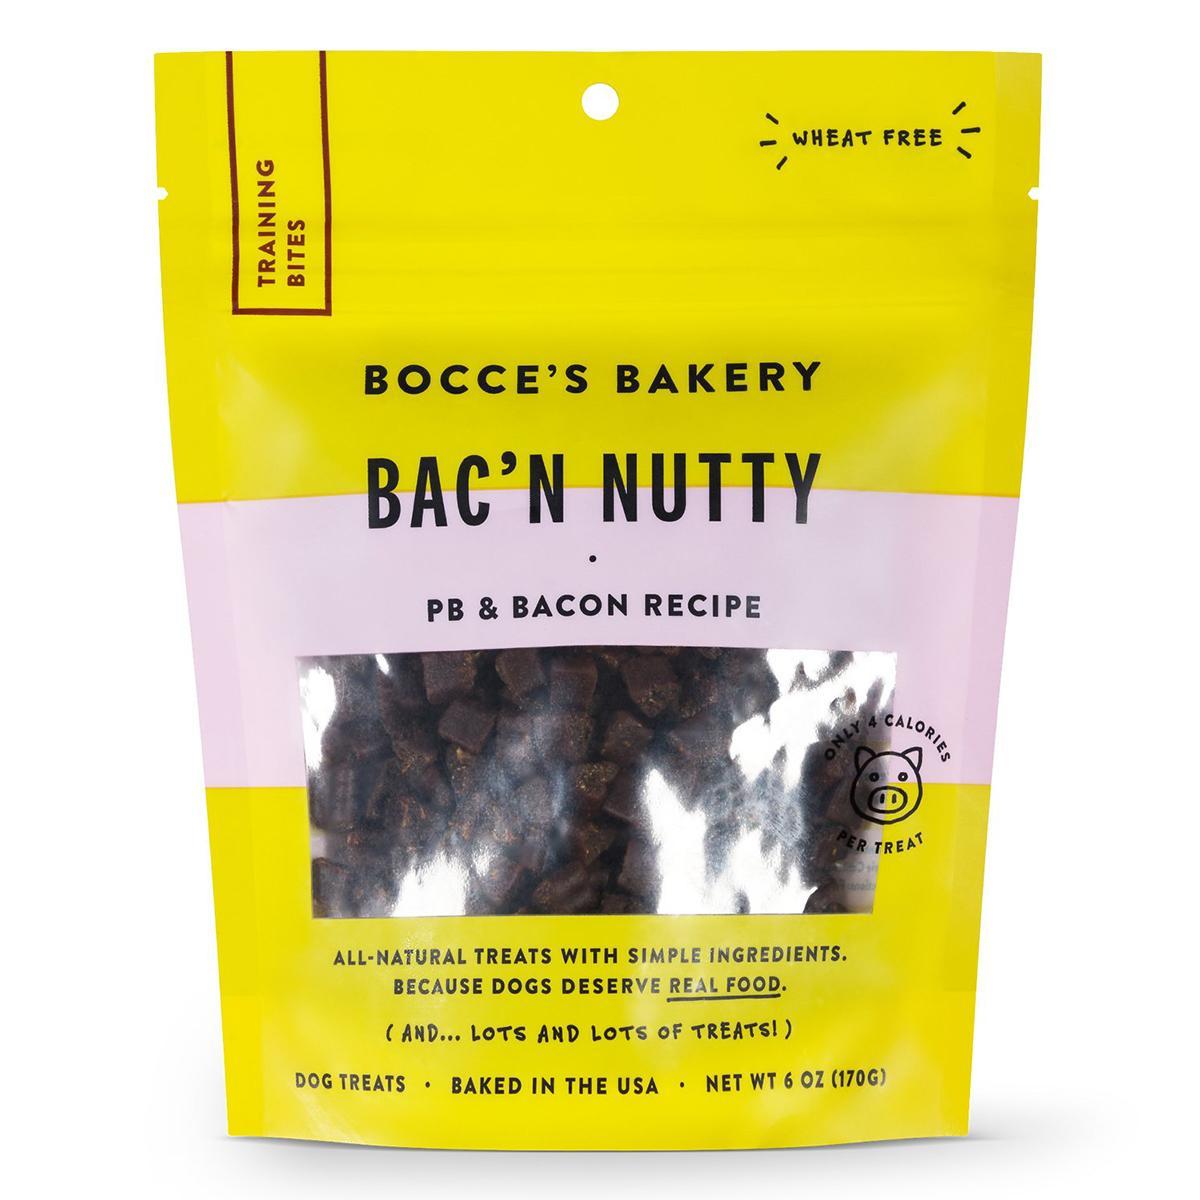 Bocce's Bakery Bac N' Nutty PB & Bacon Training Bites Dog Treats